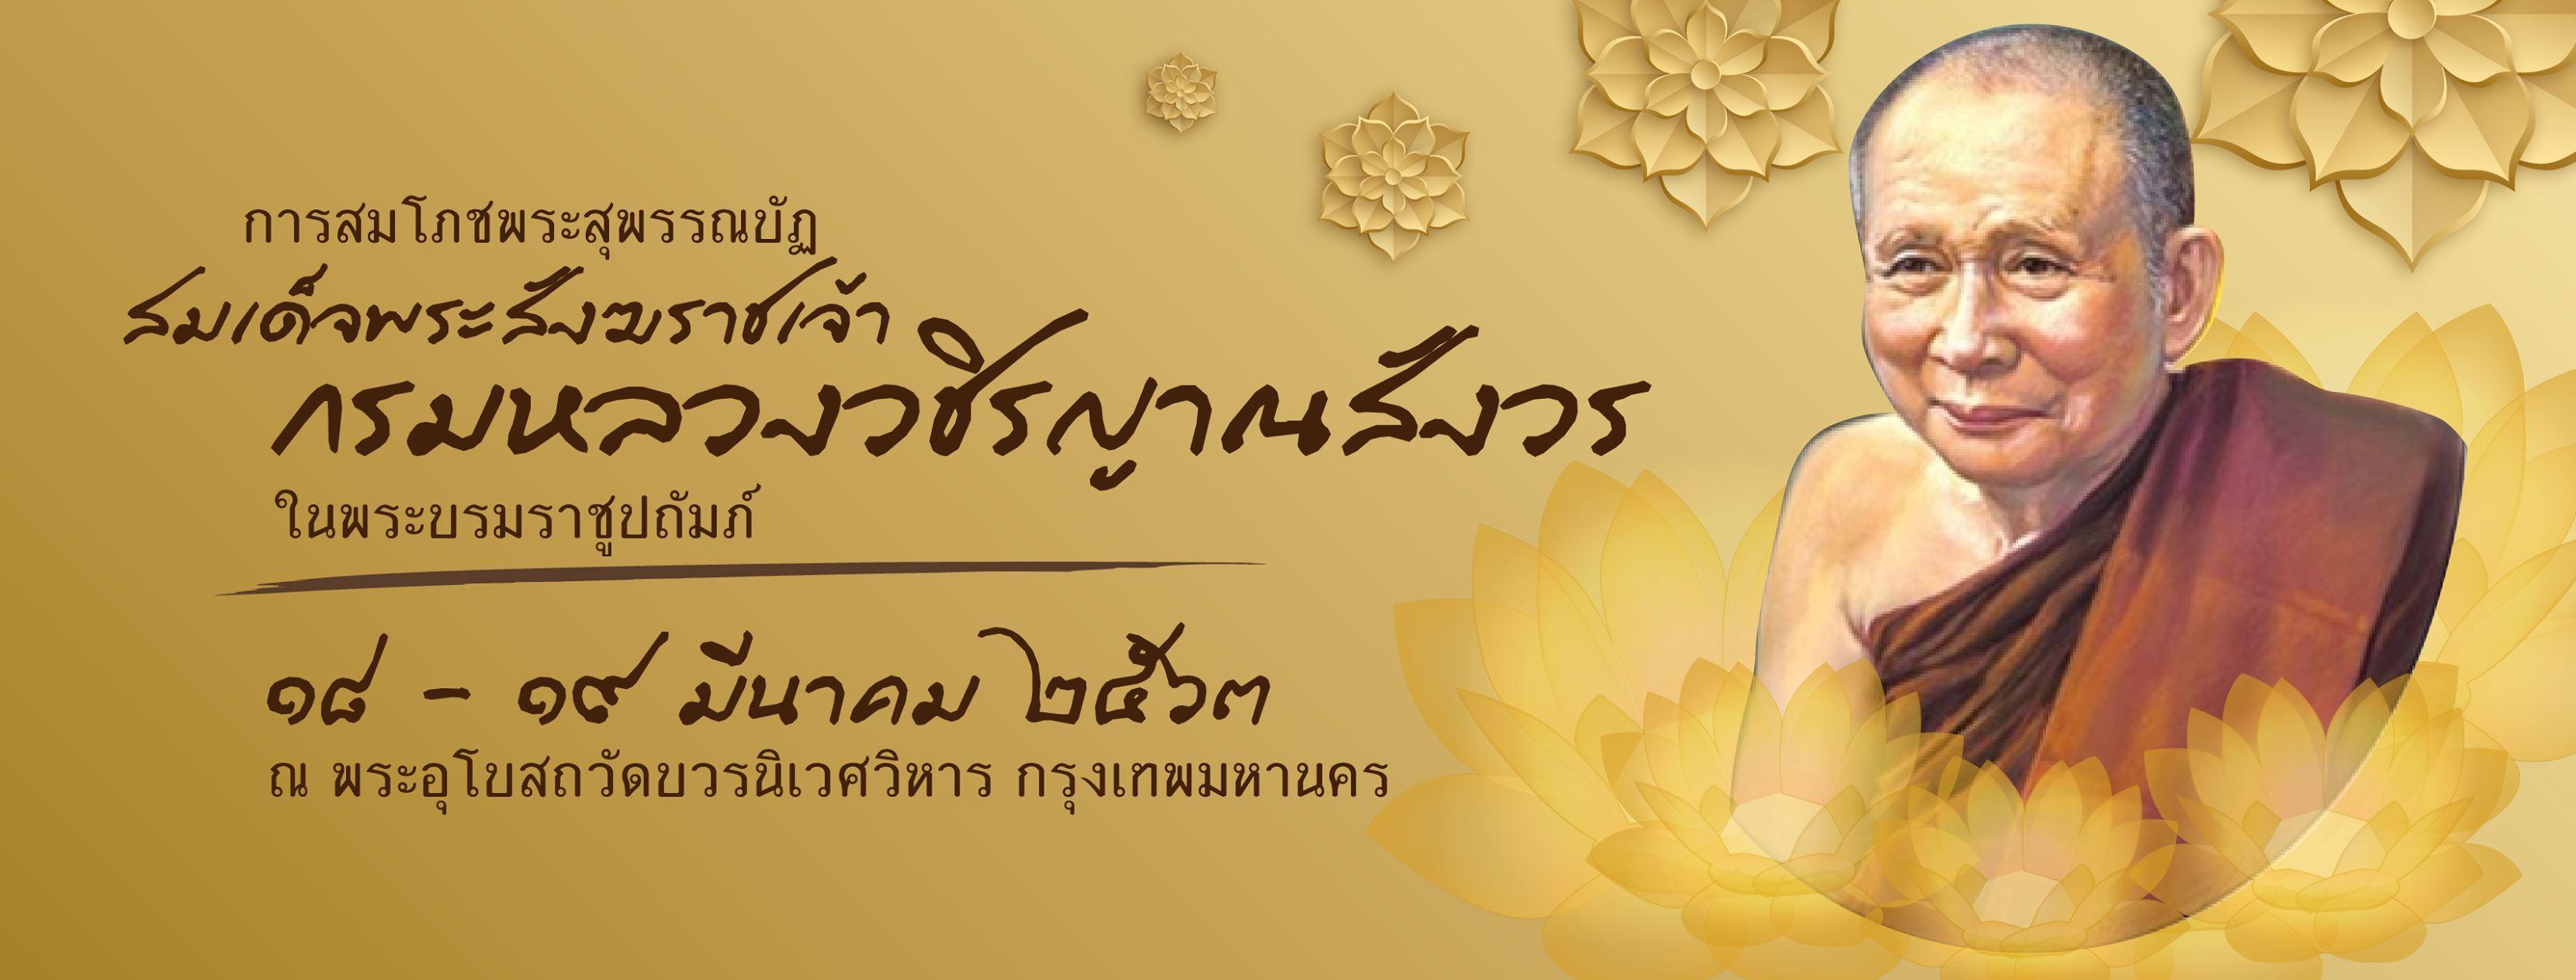 Banner FB